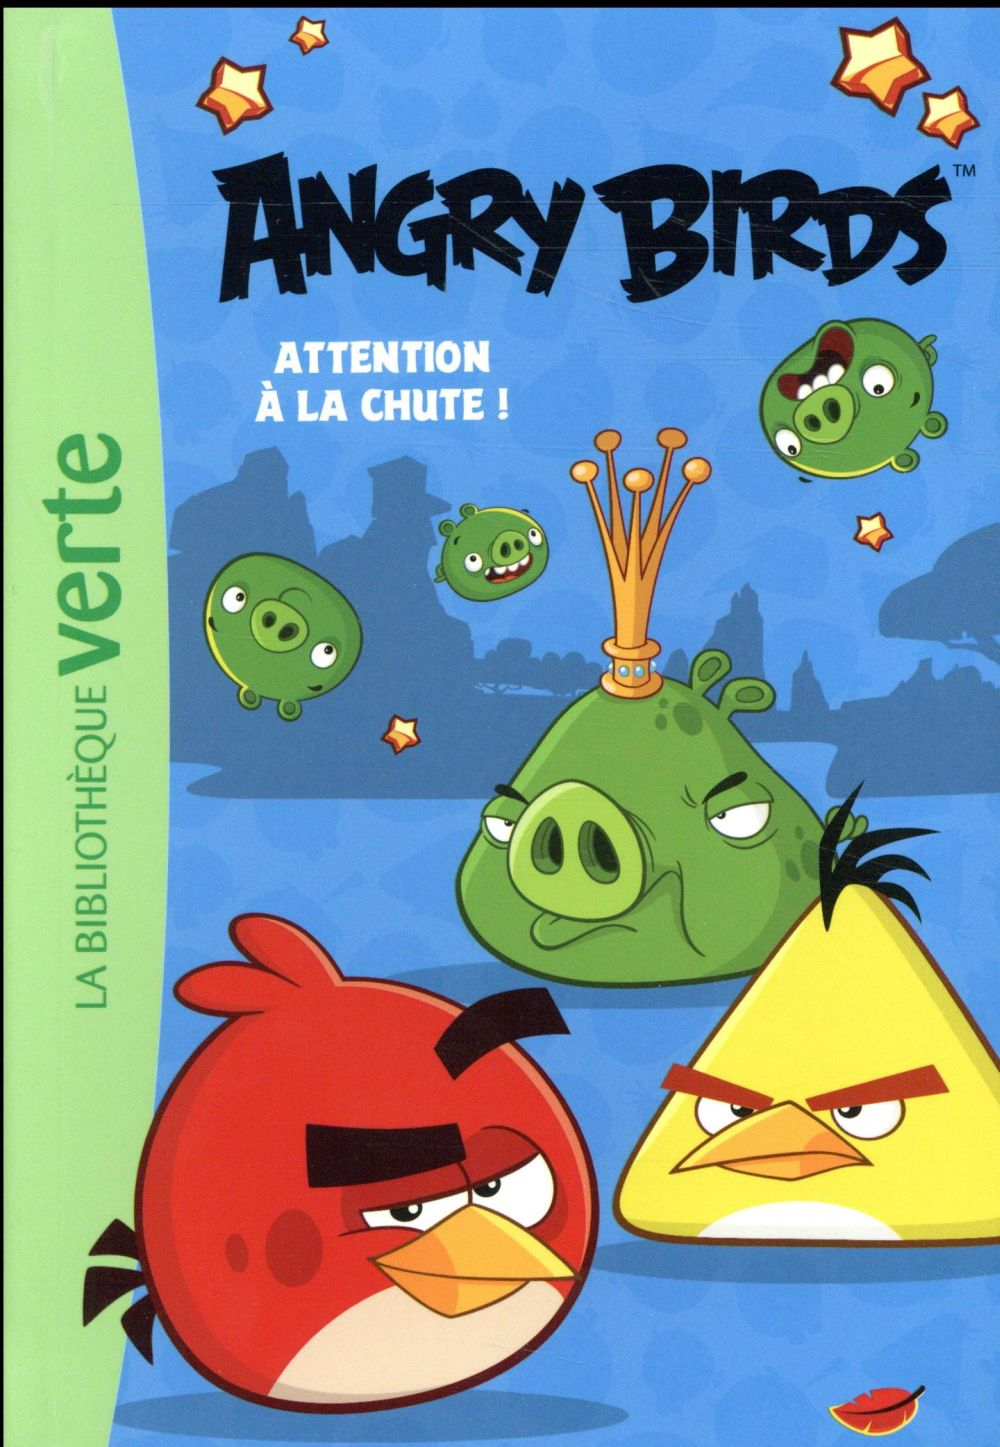 ANGRY BIRDS 01 - ATTENTION A LA CHUTE